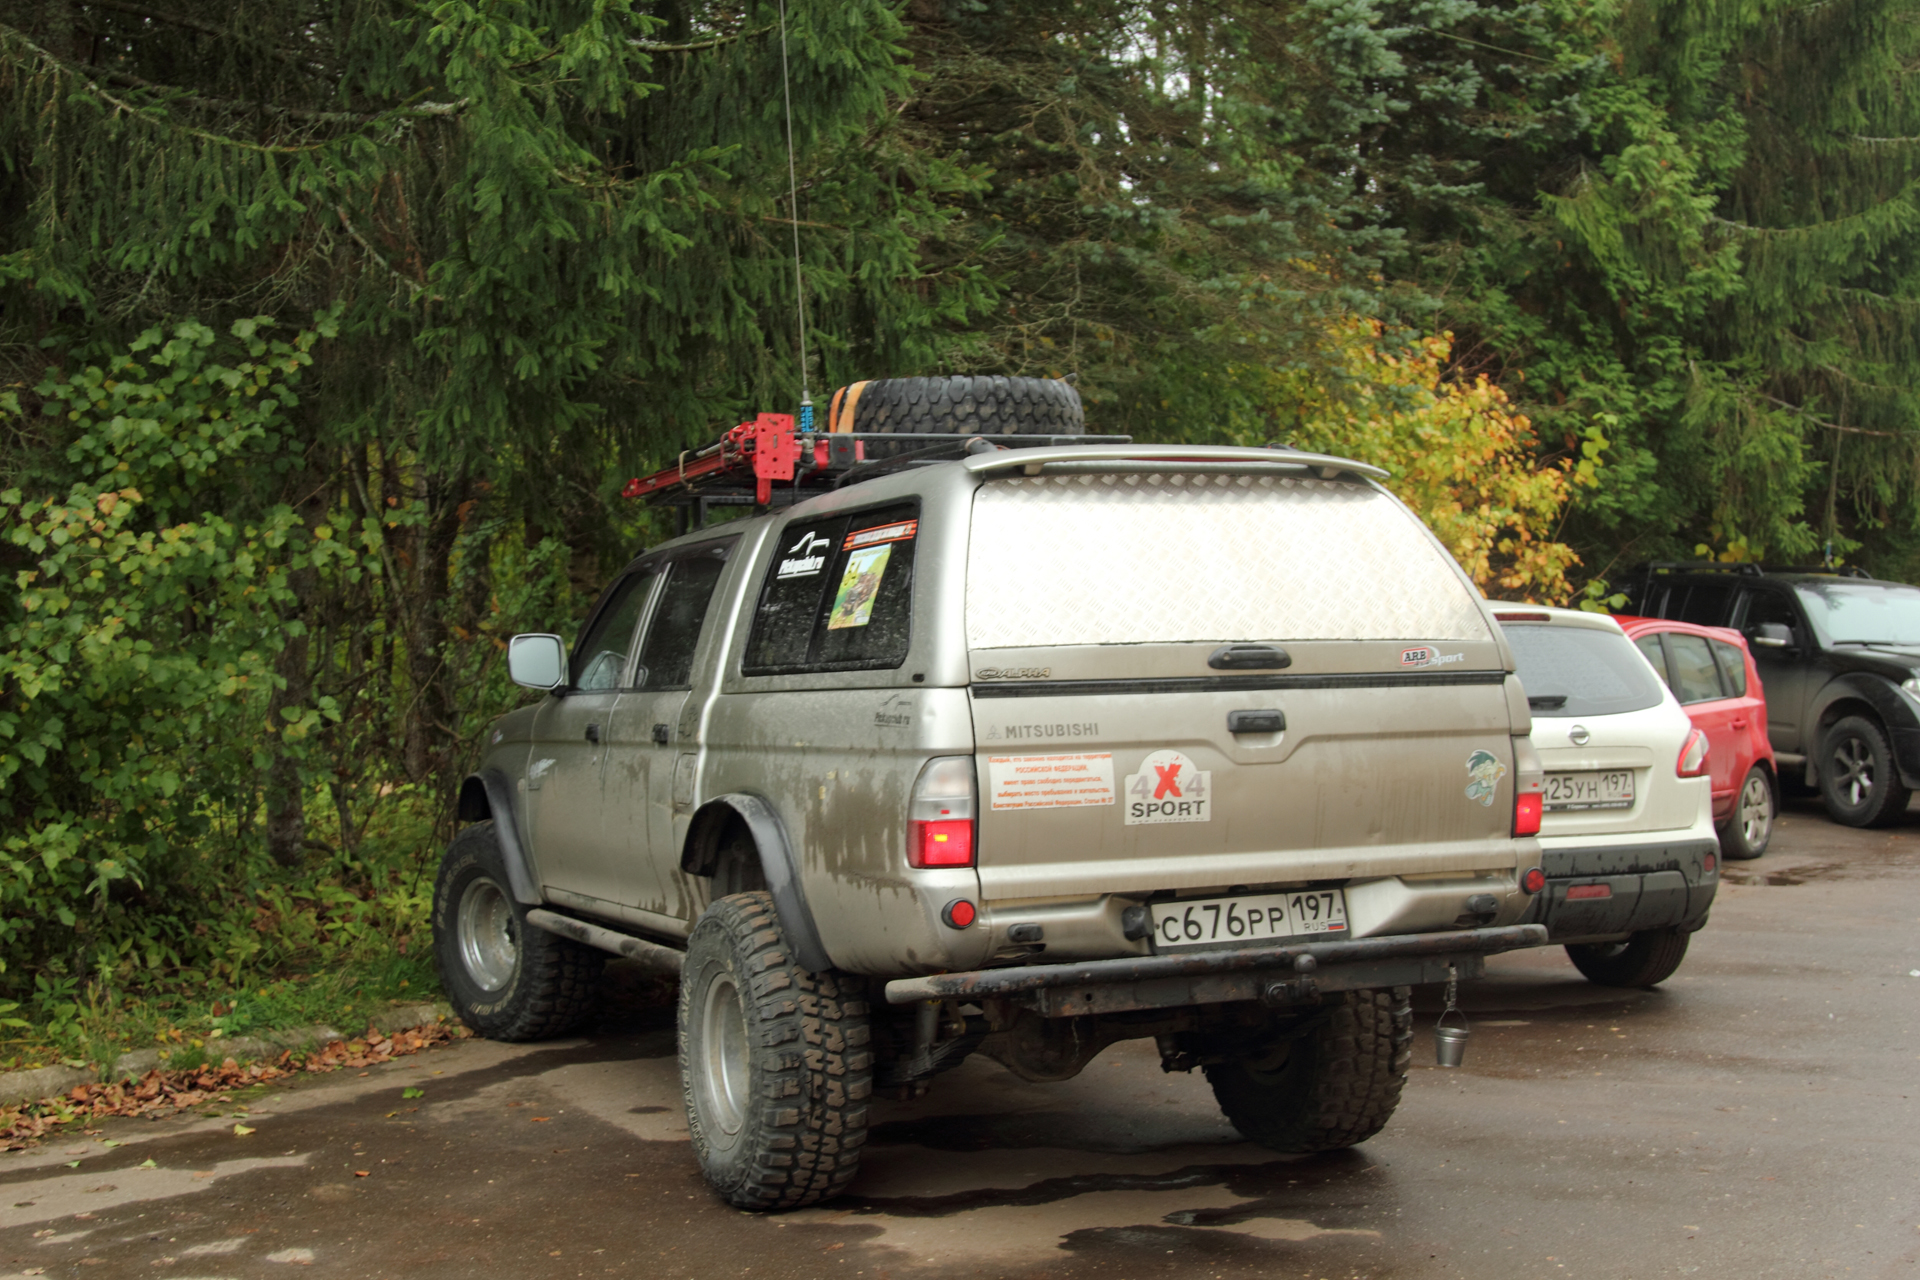 ISEA autoclubman 555